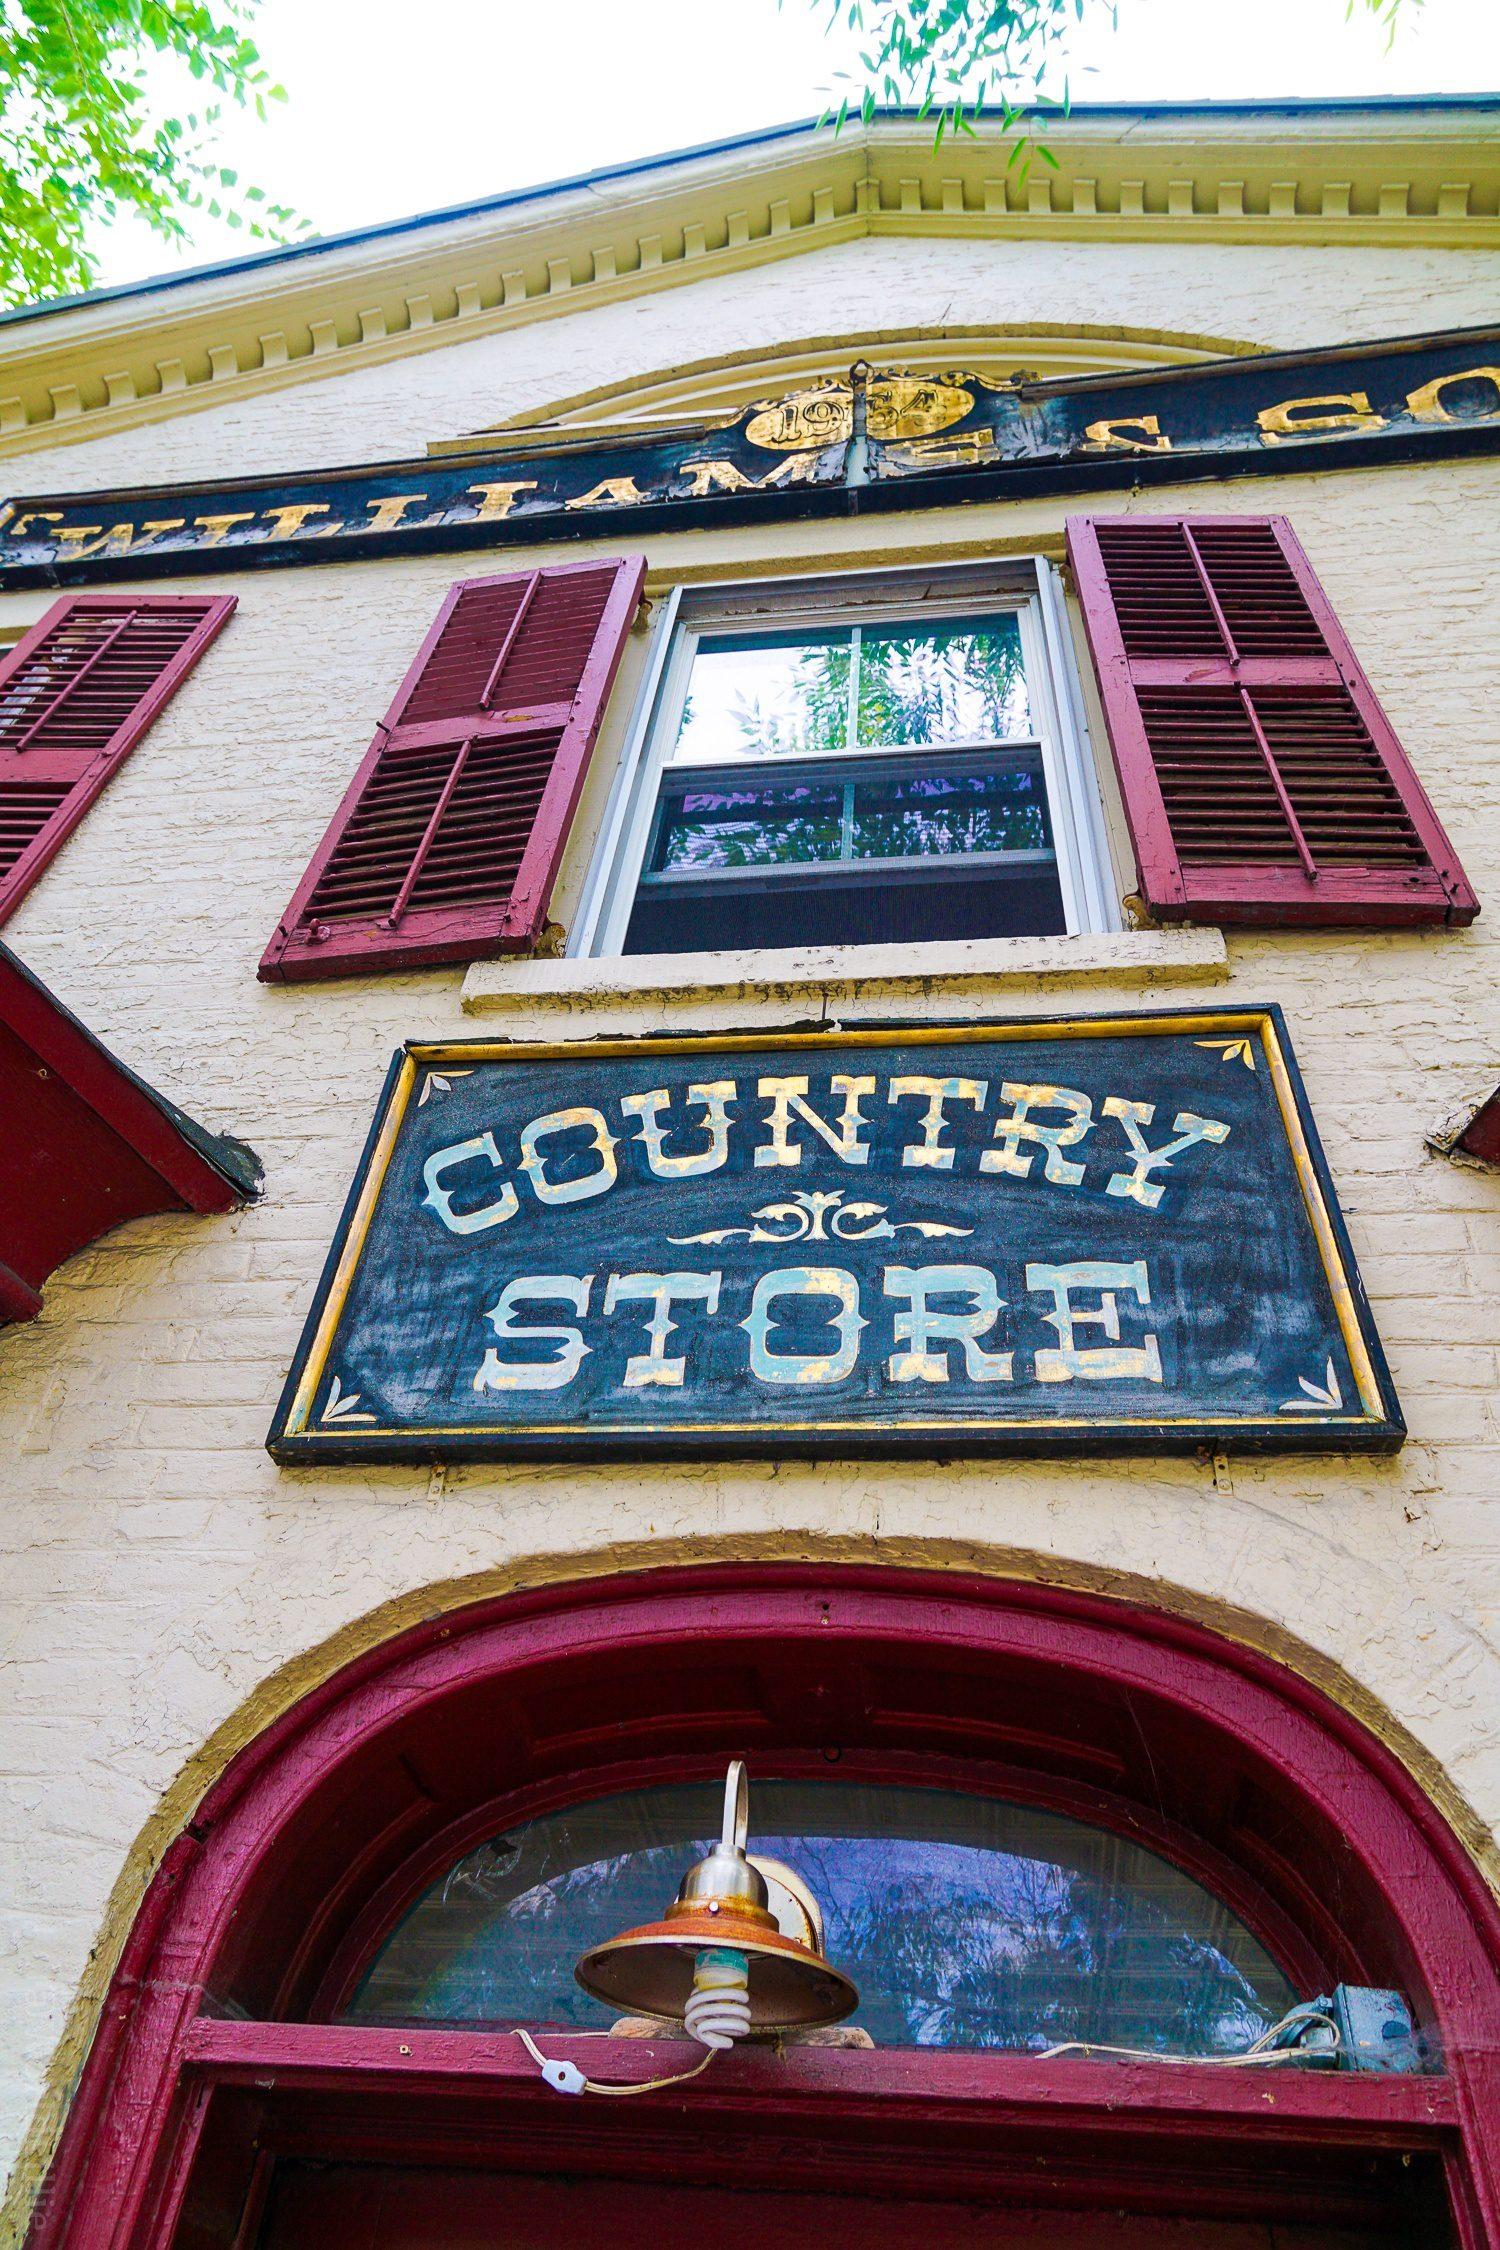 Country store in Stockbridge, Massachusetts in the Berkshires of Western MA